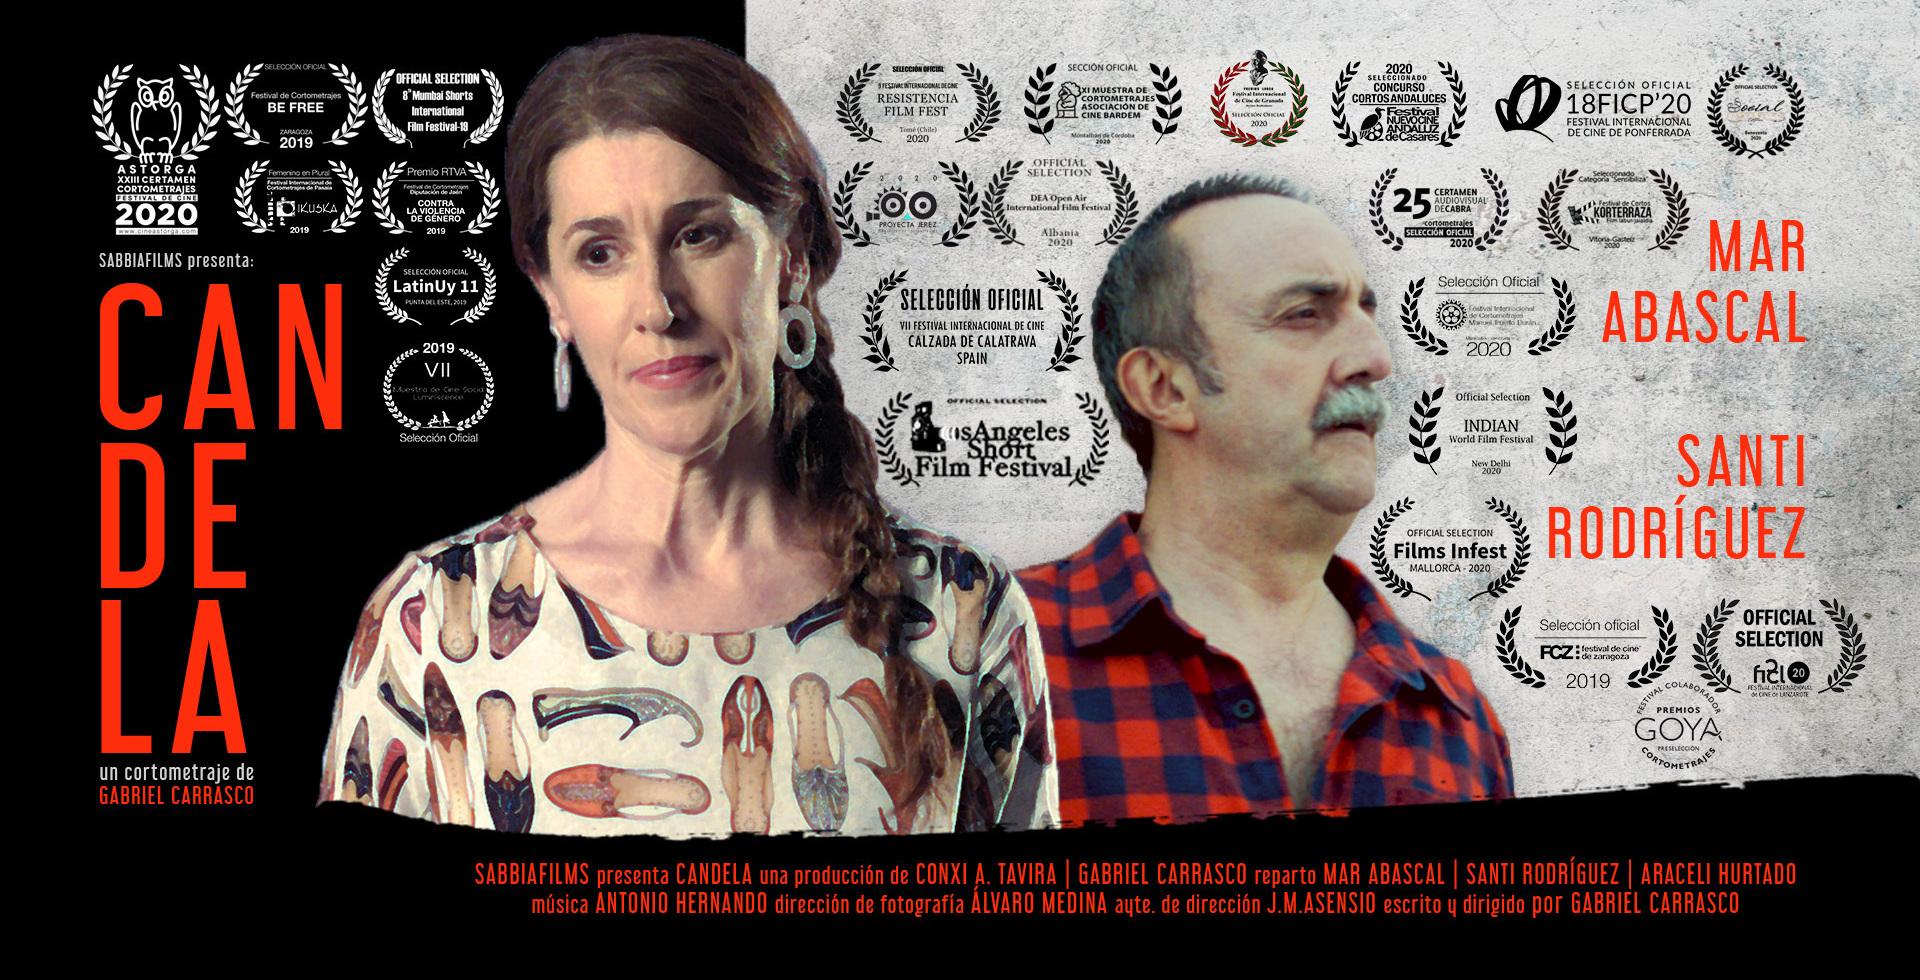 header image of the shortmovie of Candela